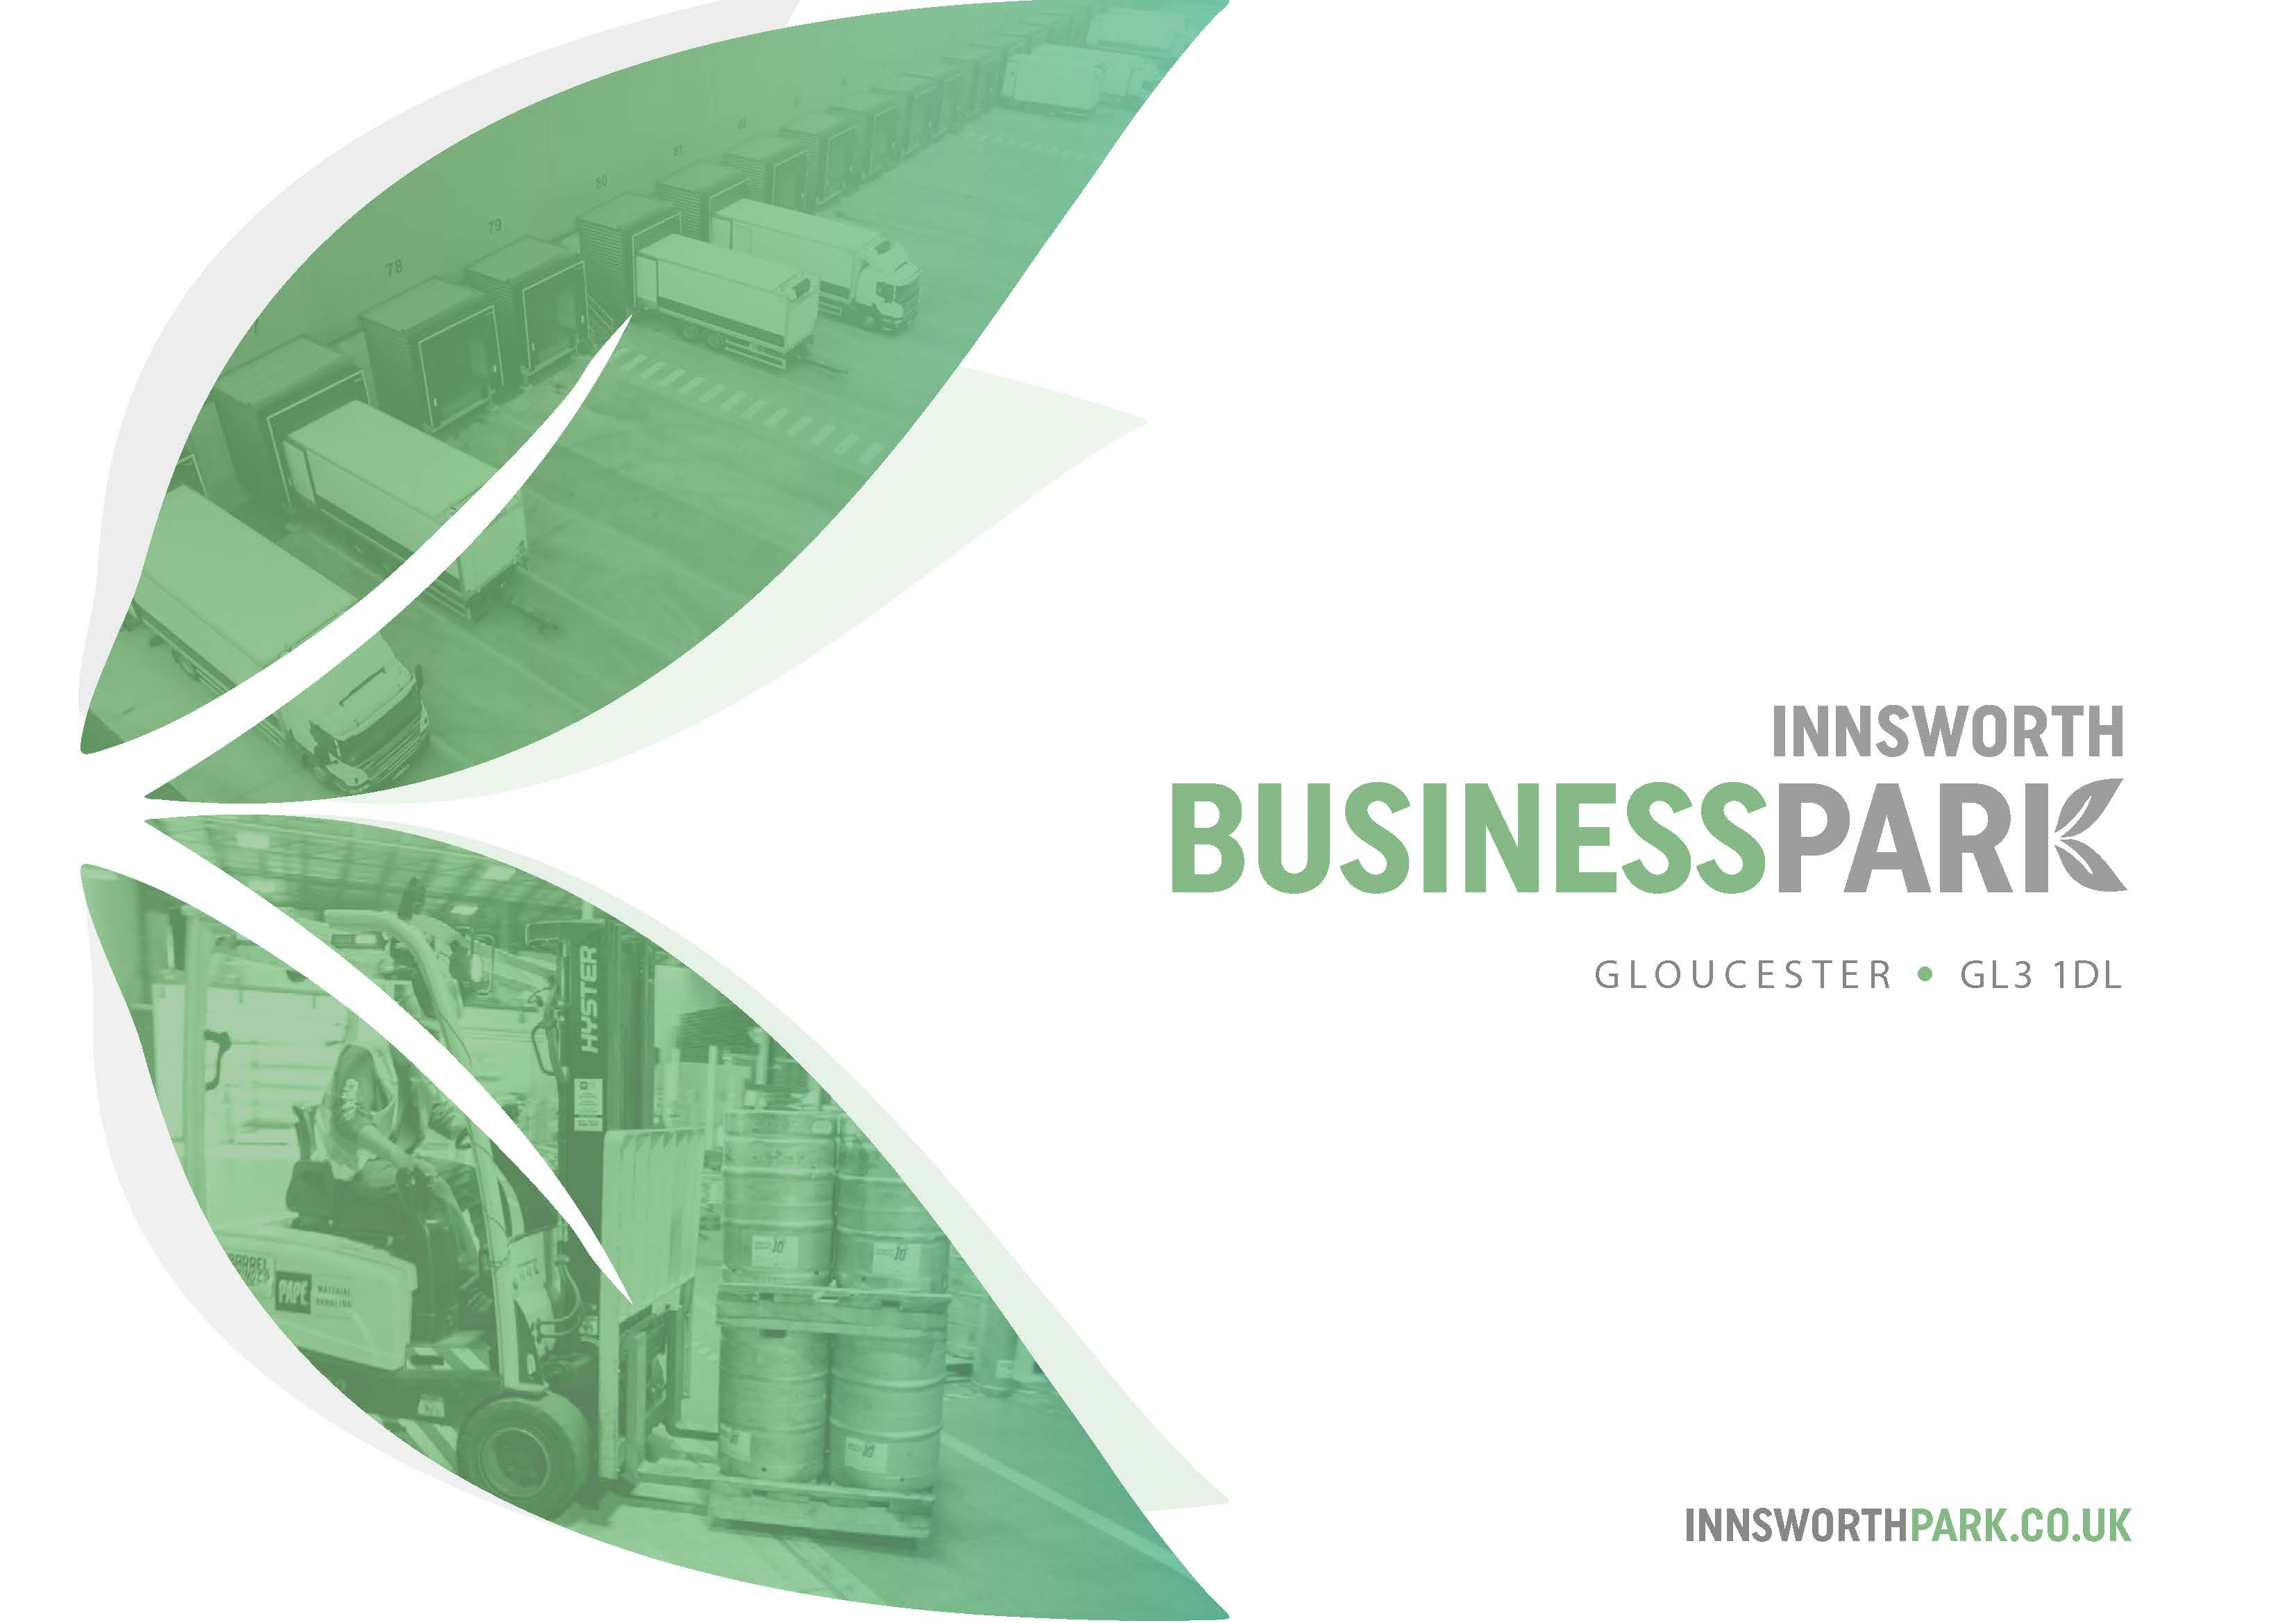 Innsworth Business Park, GLOUCESTER